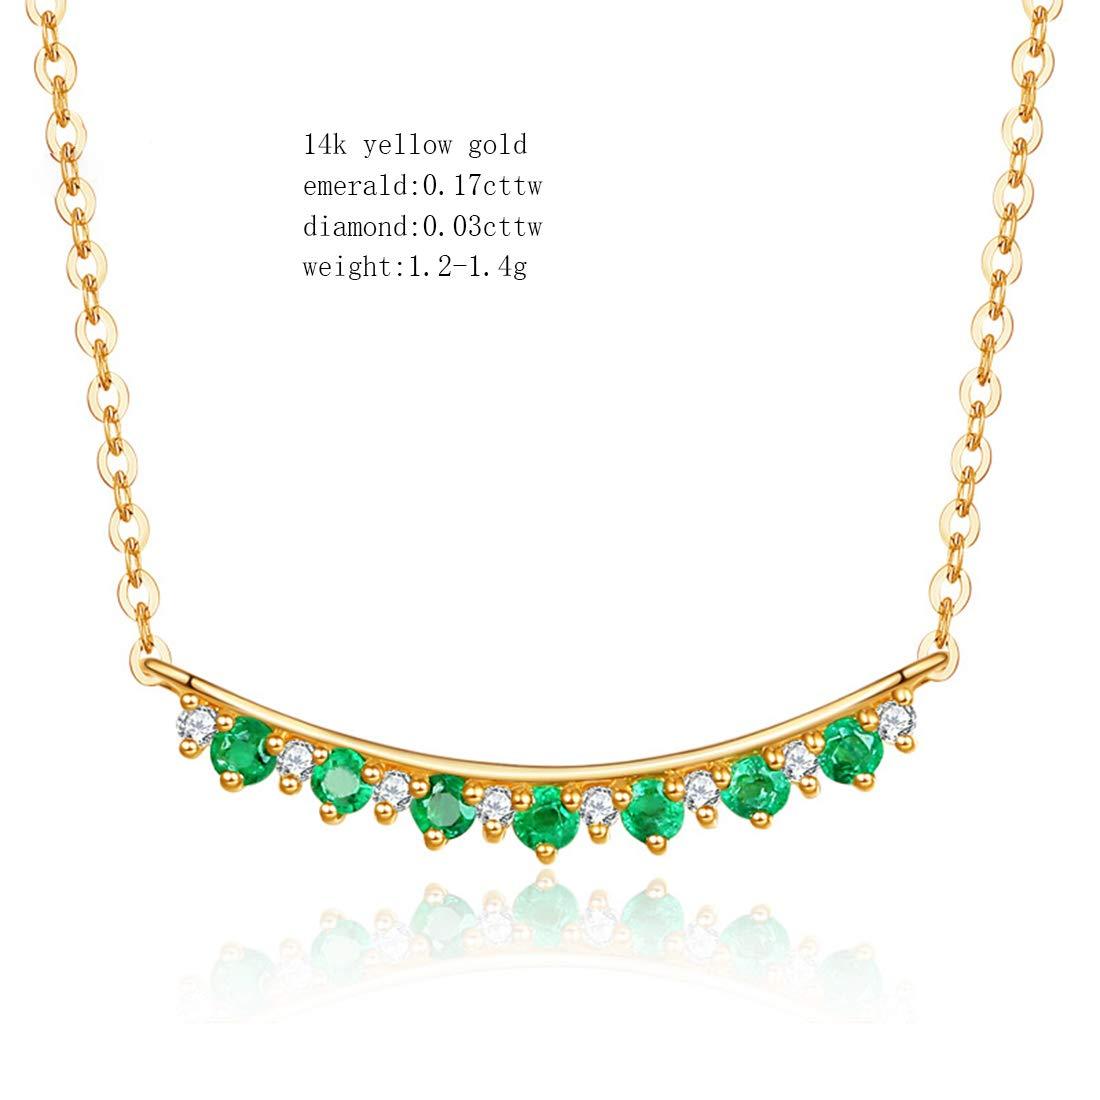 16 Carleen 14k Solid Yellow Gold 0.17ct Natural Green Emerald 0.03cttw Diamond Sideways Bar Pendant Necklace For Women Girls 2 Extender